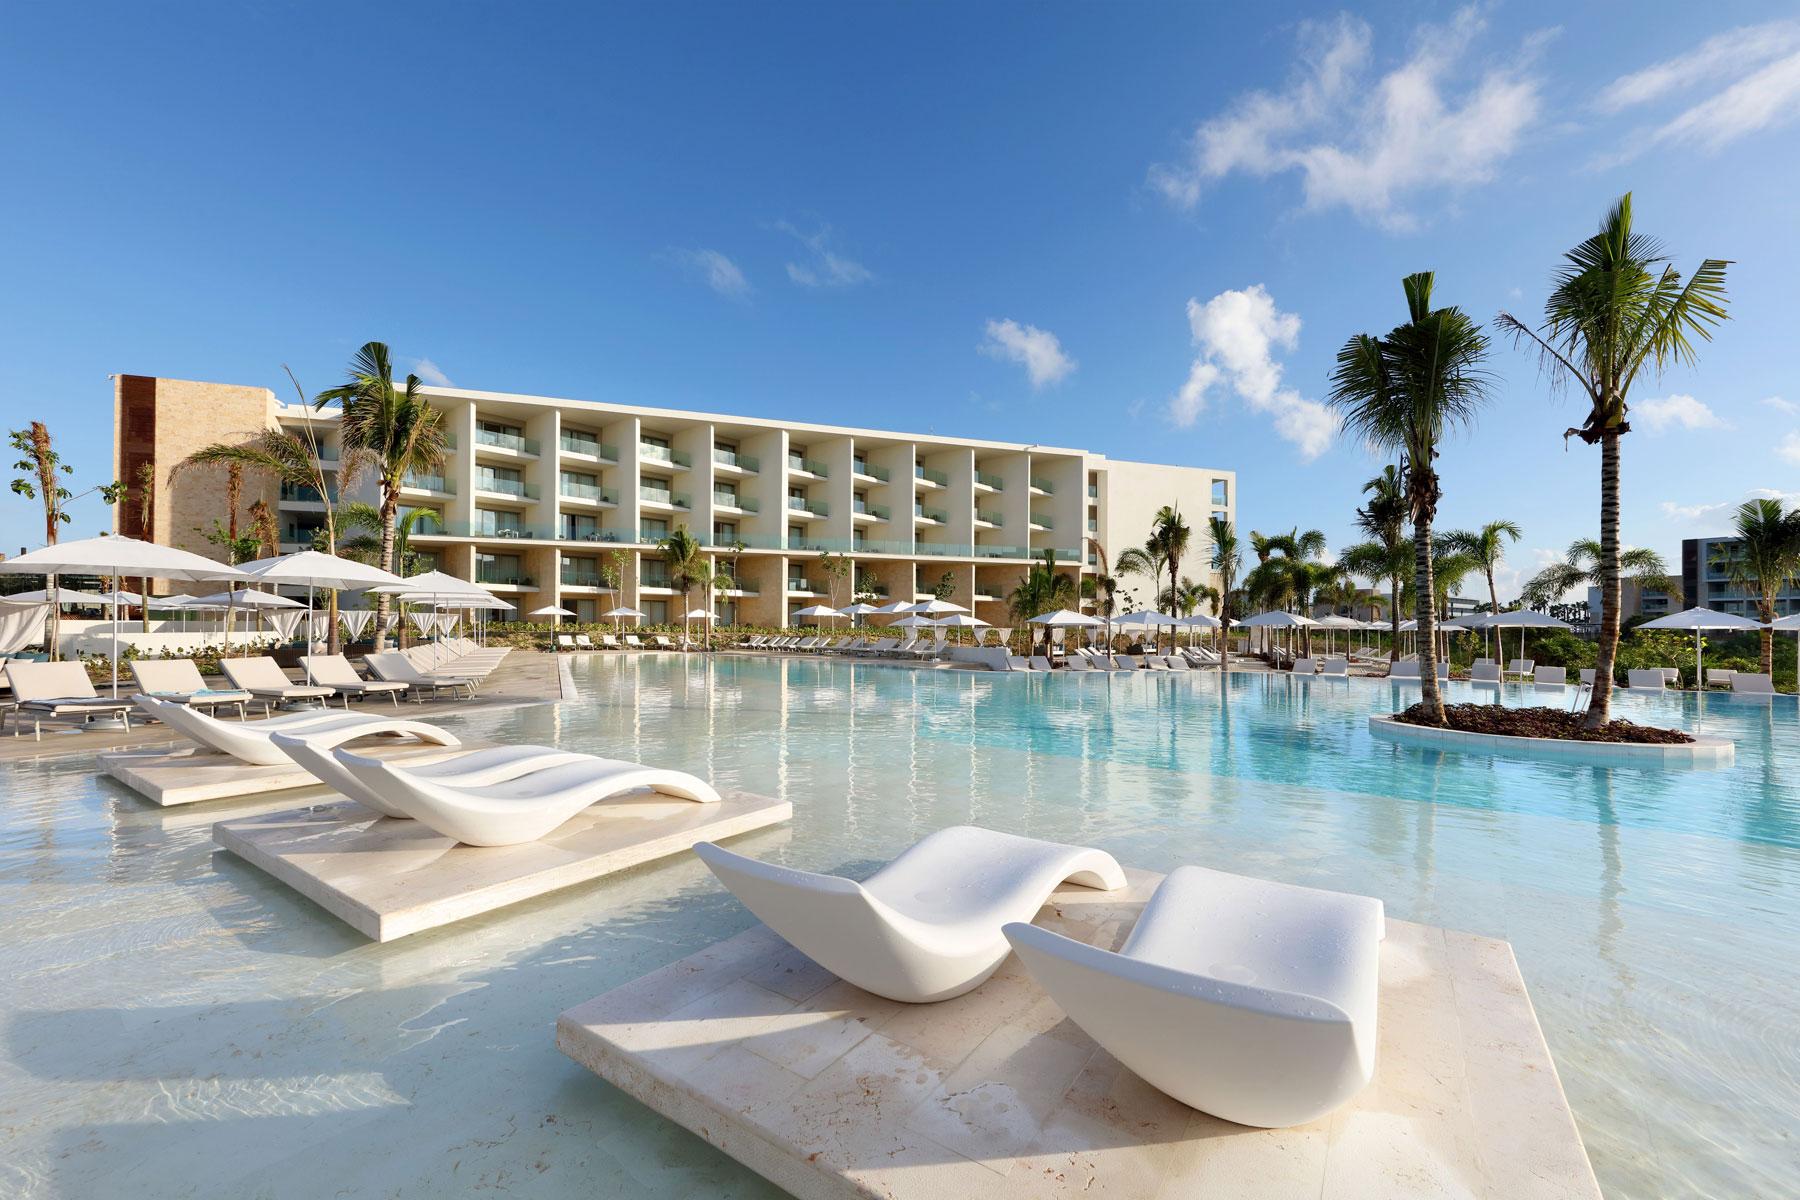 piscina del hotel costa mujeres